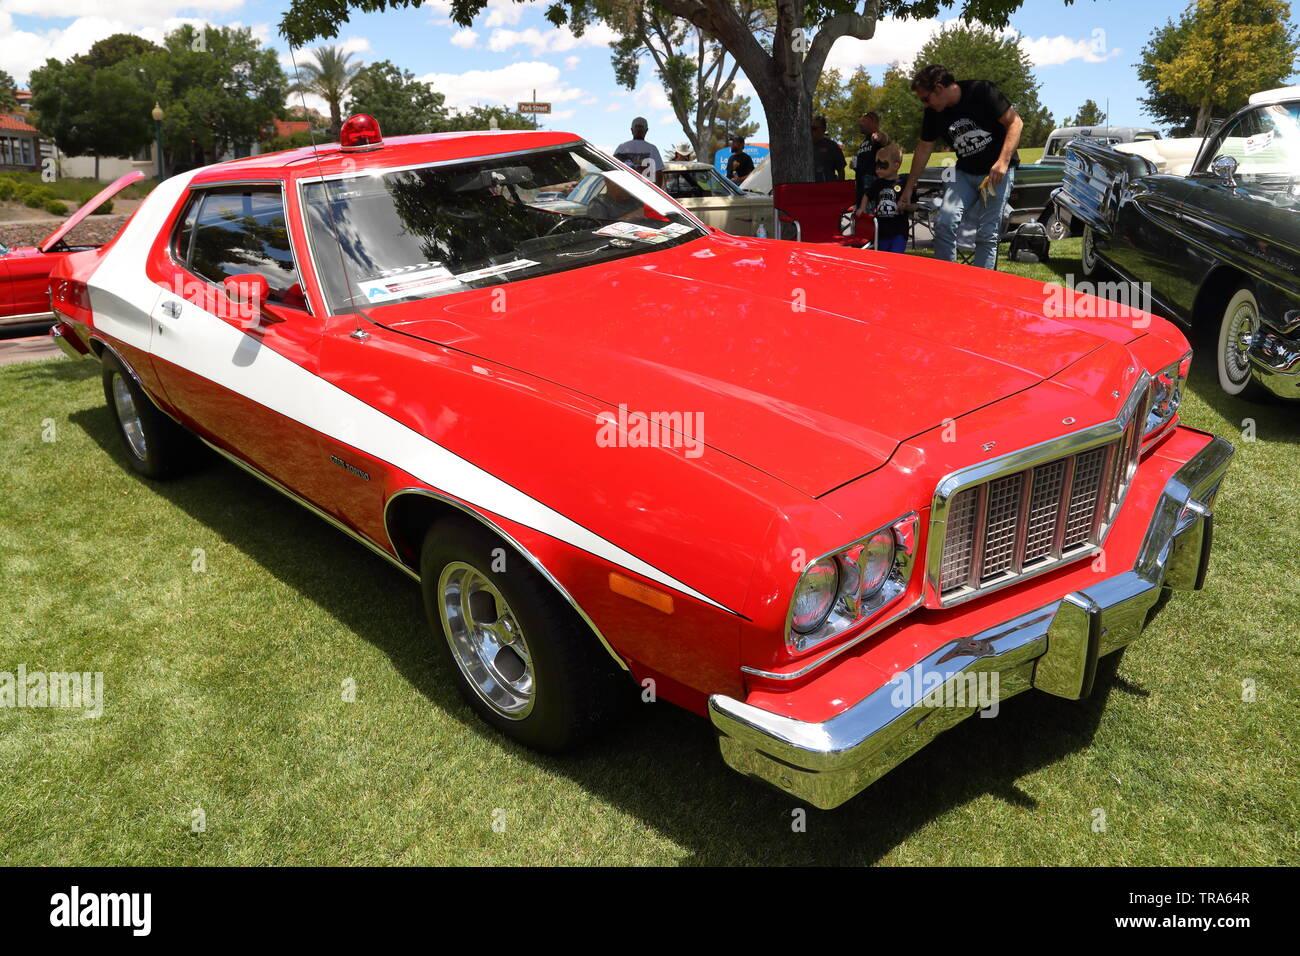 Gran Torino Stockfotos & Gran Torino Bilder - Alamy